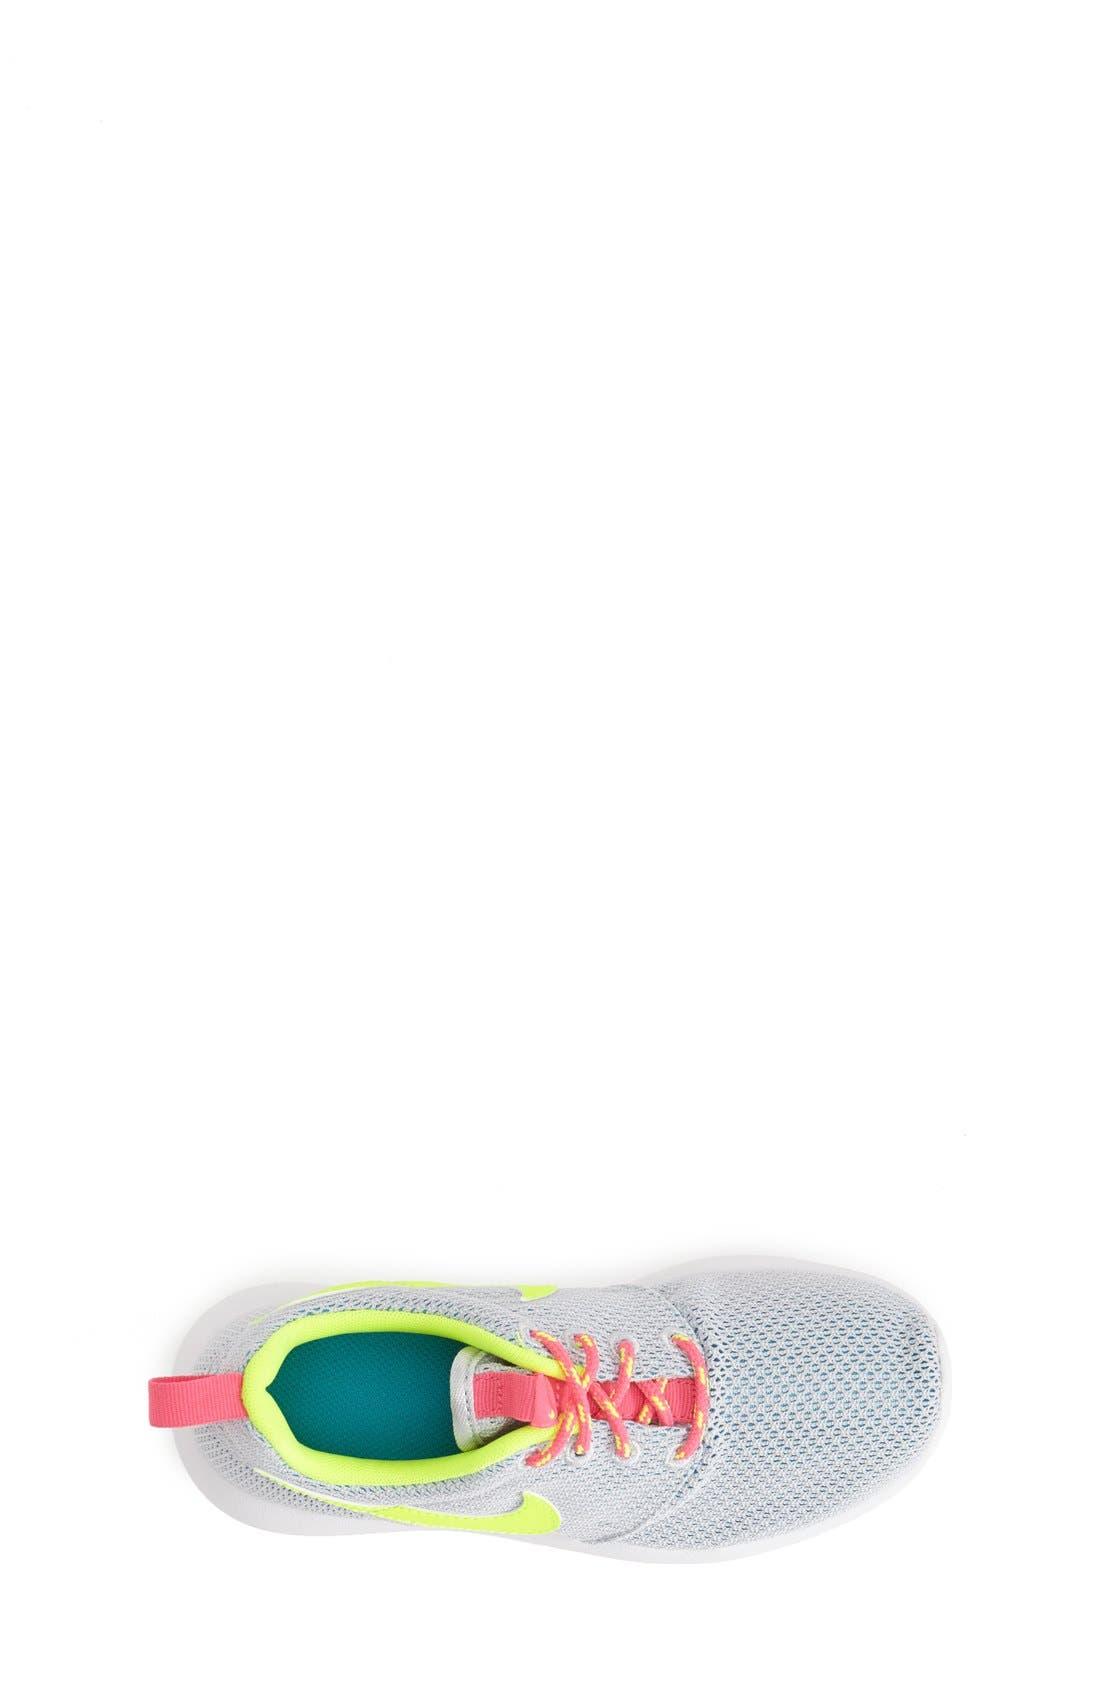 'Roshe Run' Athletic Shoe,                             Alternate thumbnail 78, color,